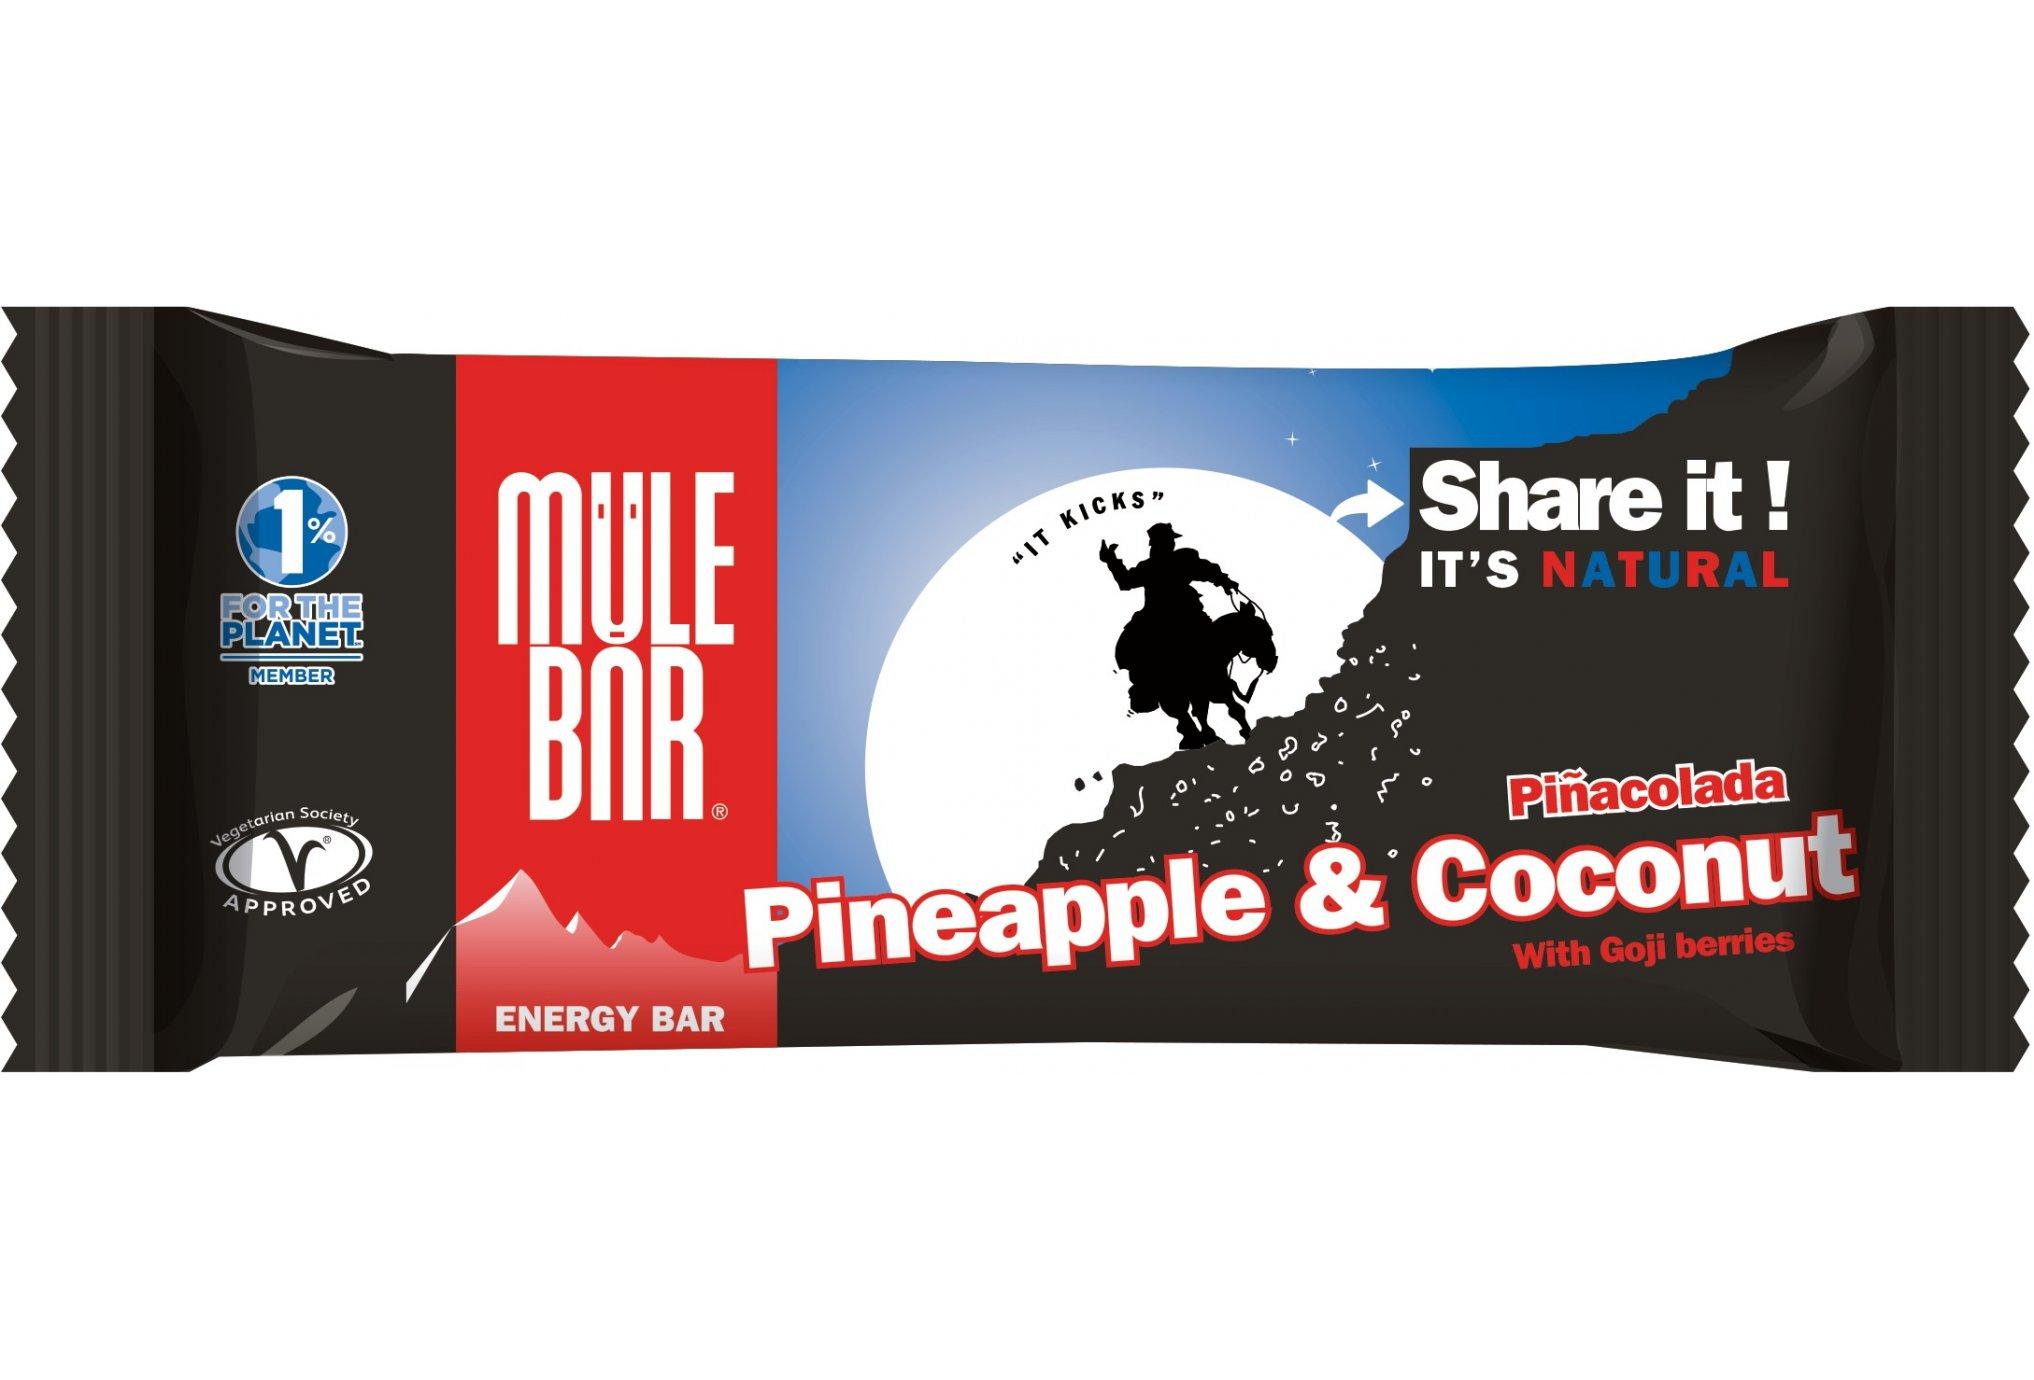 Mulebar Barre Energétique Pinacolada - Ananas/Noix de Coco Diététique Barres